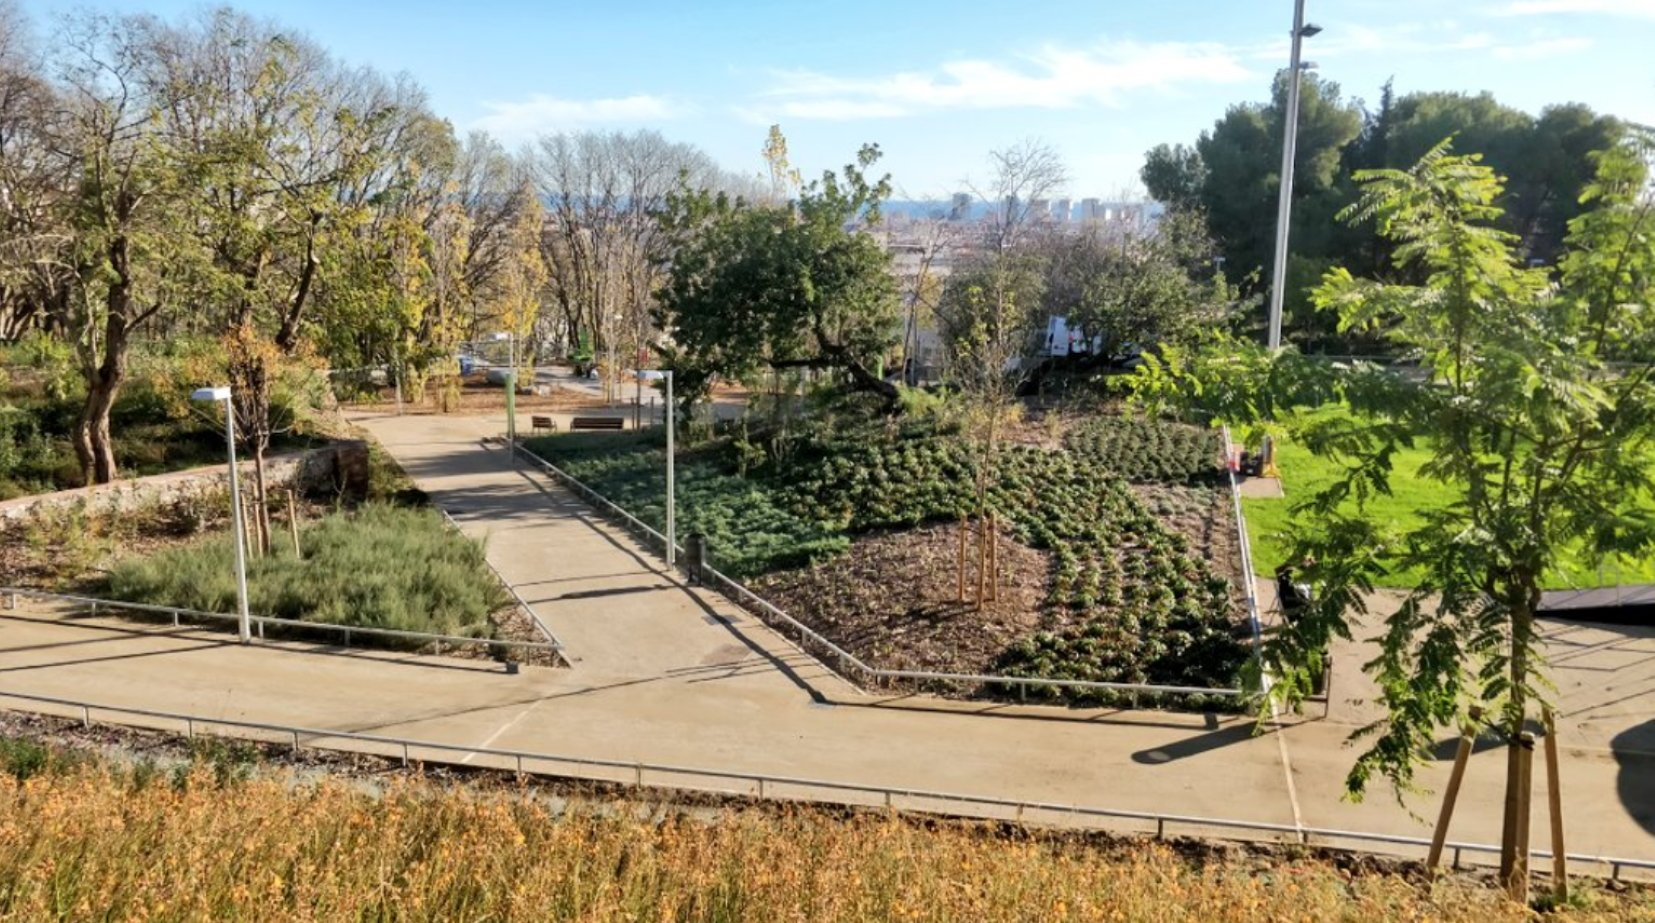 Se inauguran los jardines del Doctor Pla i Armengol, en Guinardó